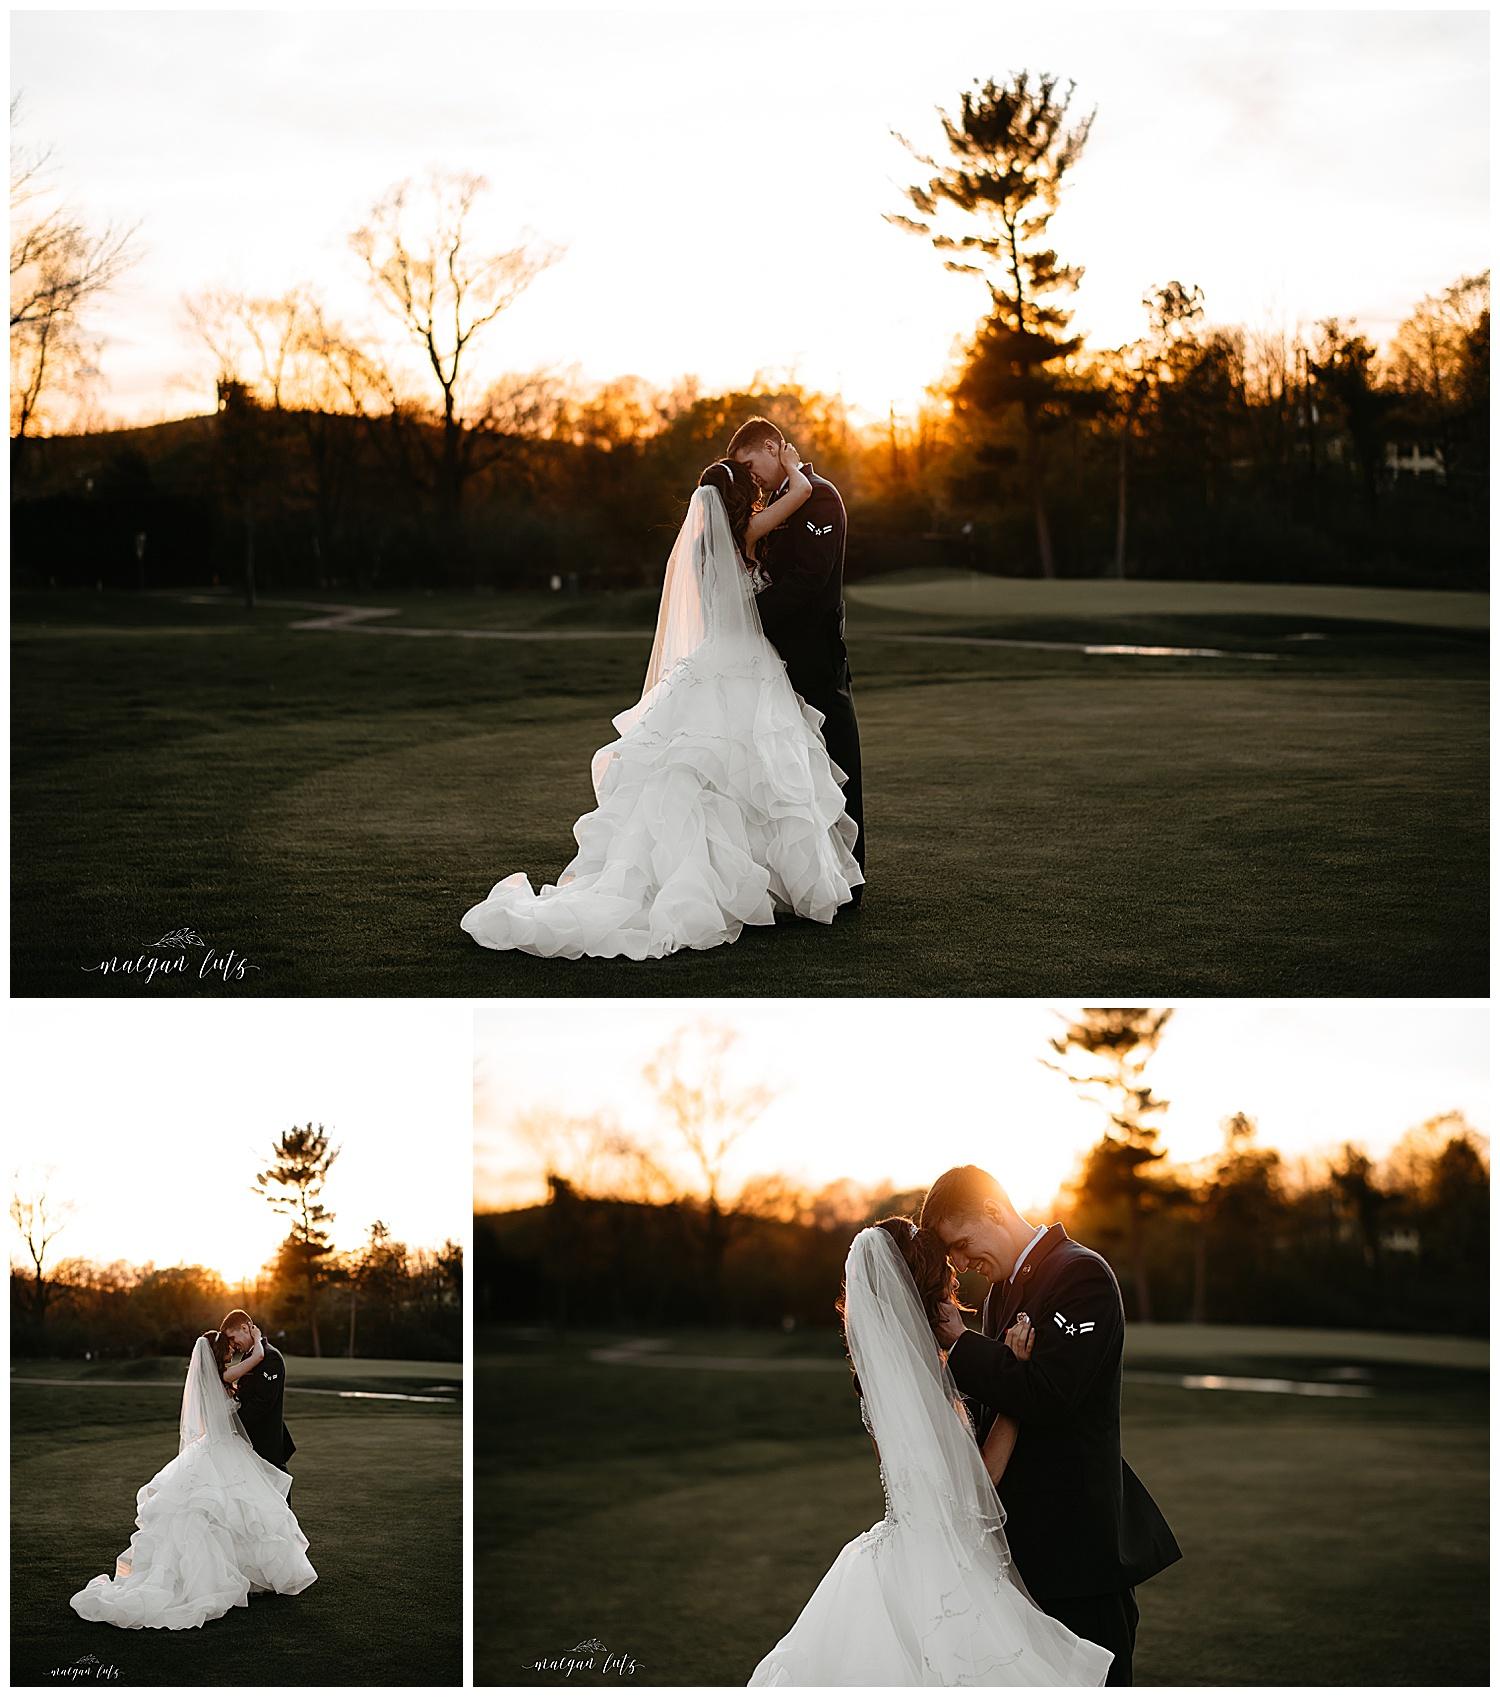 NEPA-Lehigh-Valley-Wedding-Photographer-at-Glen-Oak-Country-Club-Clarks-Summit-PA_0064.jpg